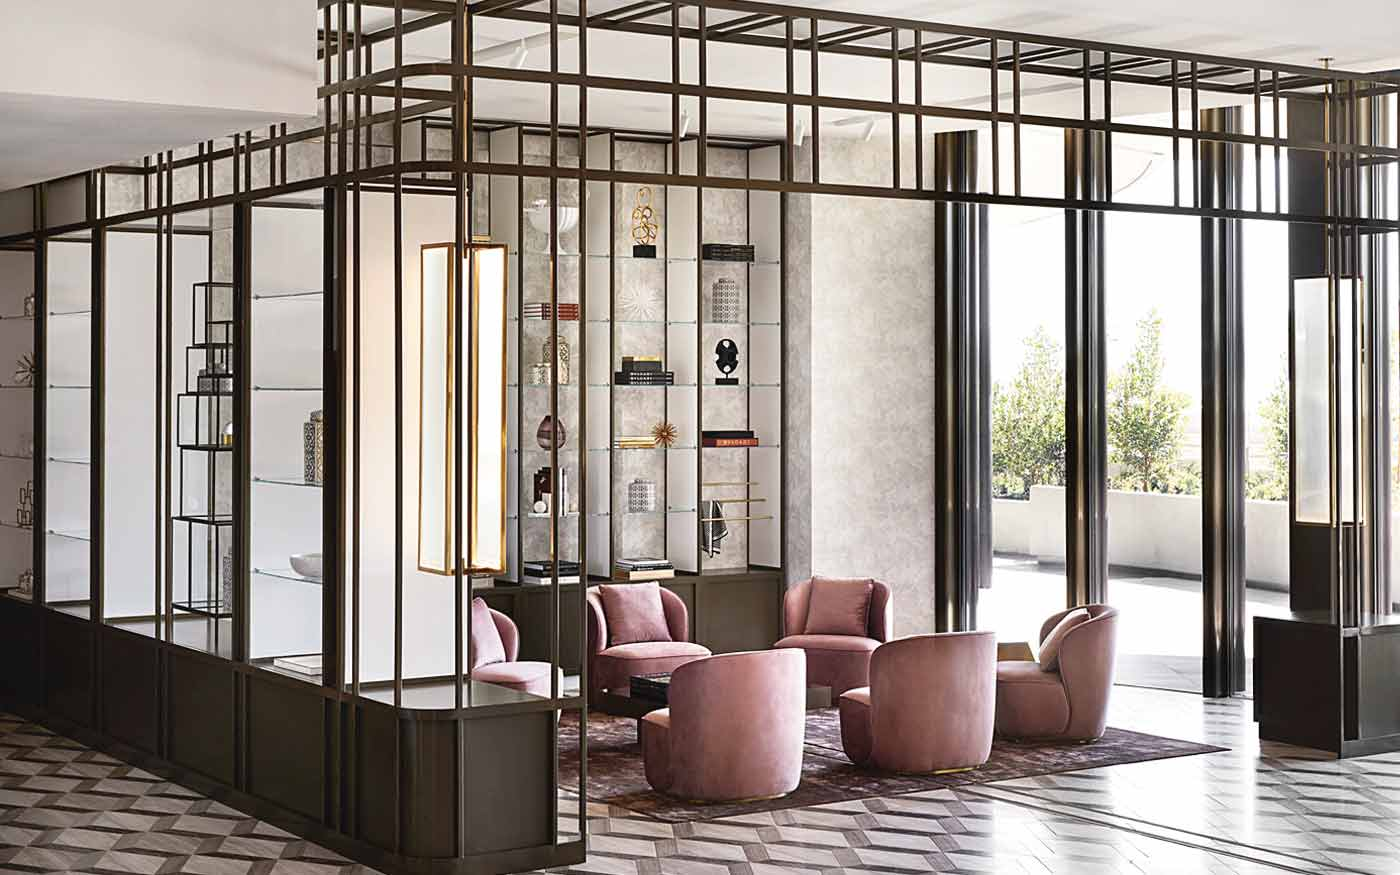 Hotel Chadstone / VIC